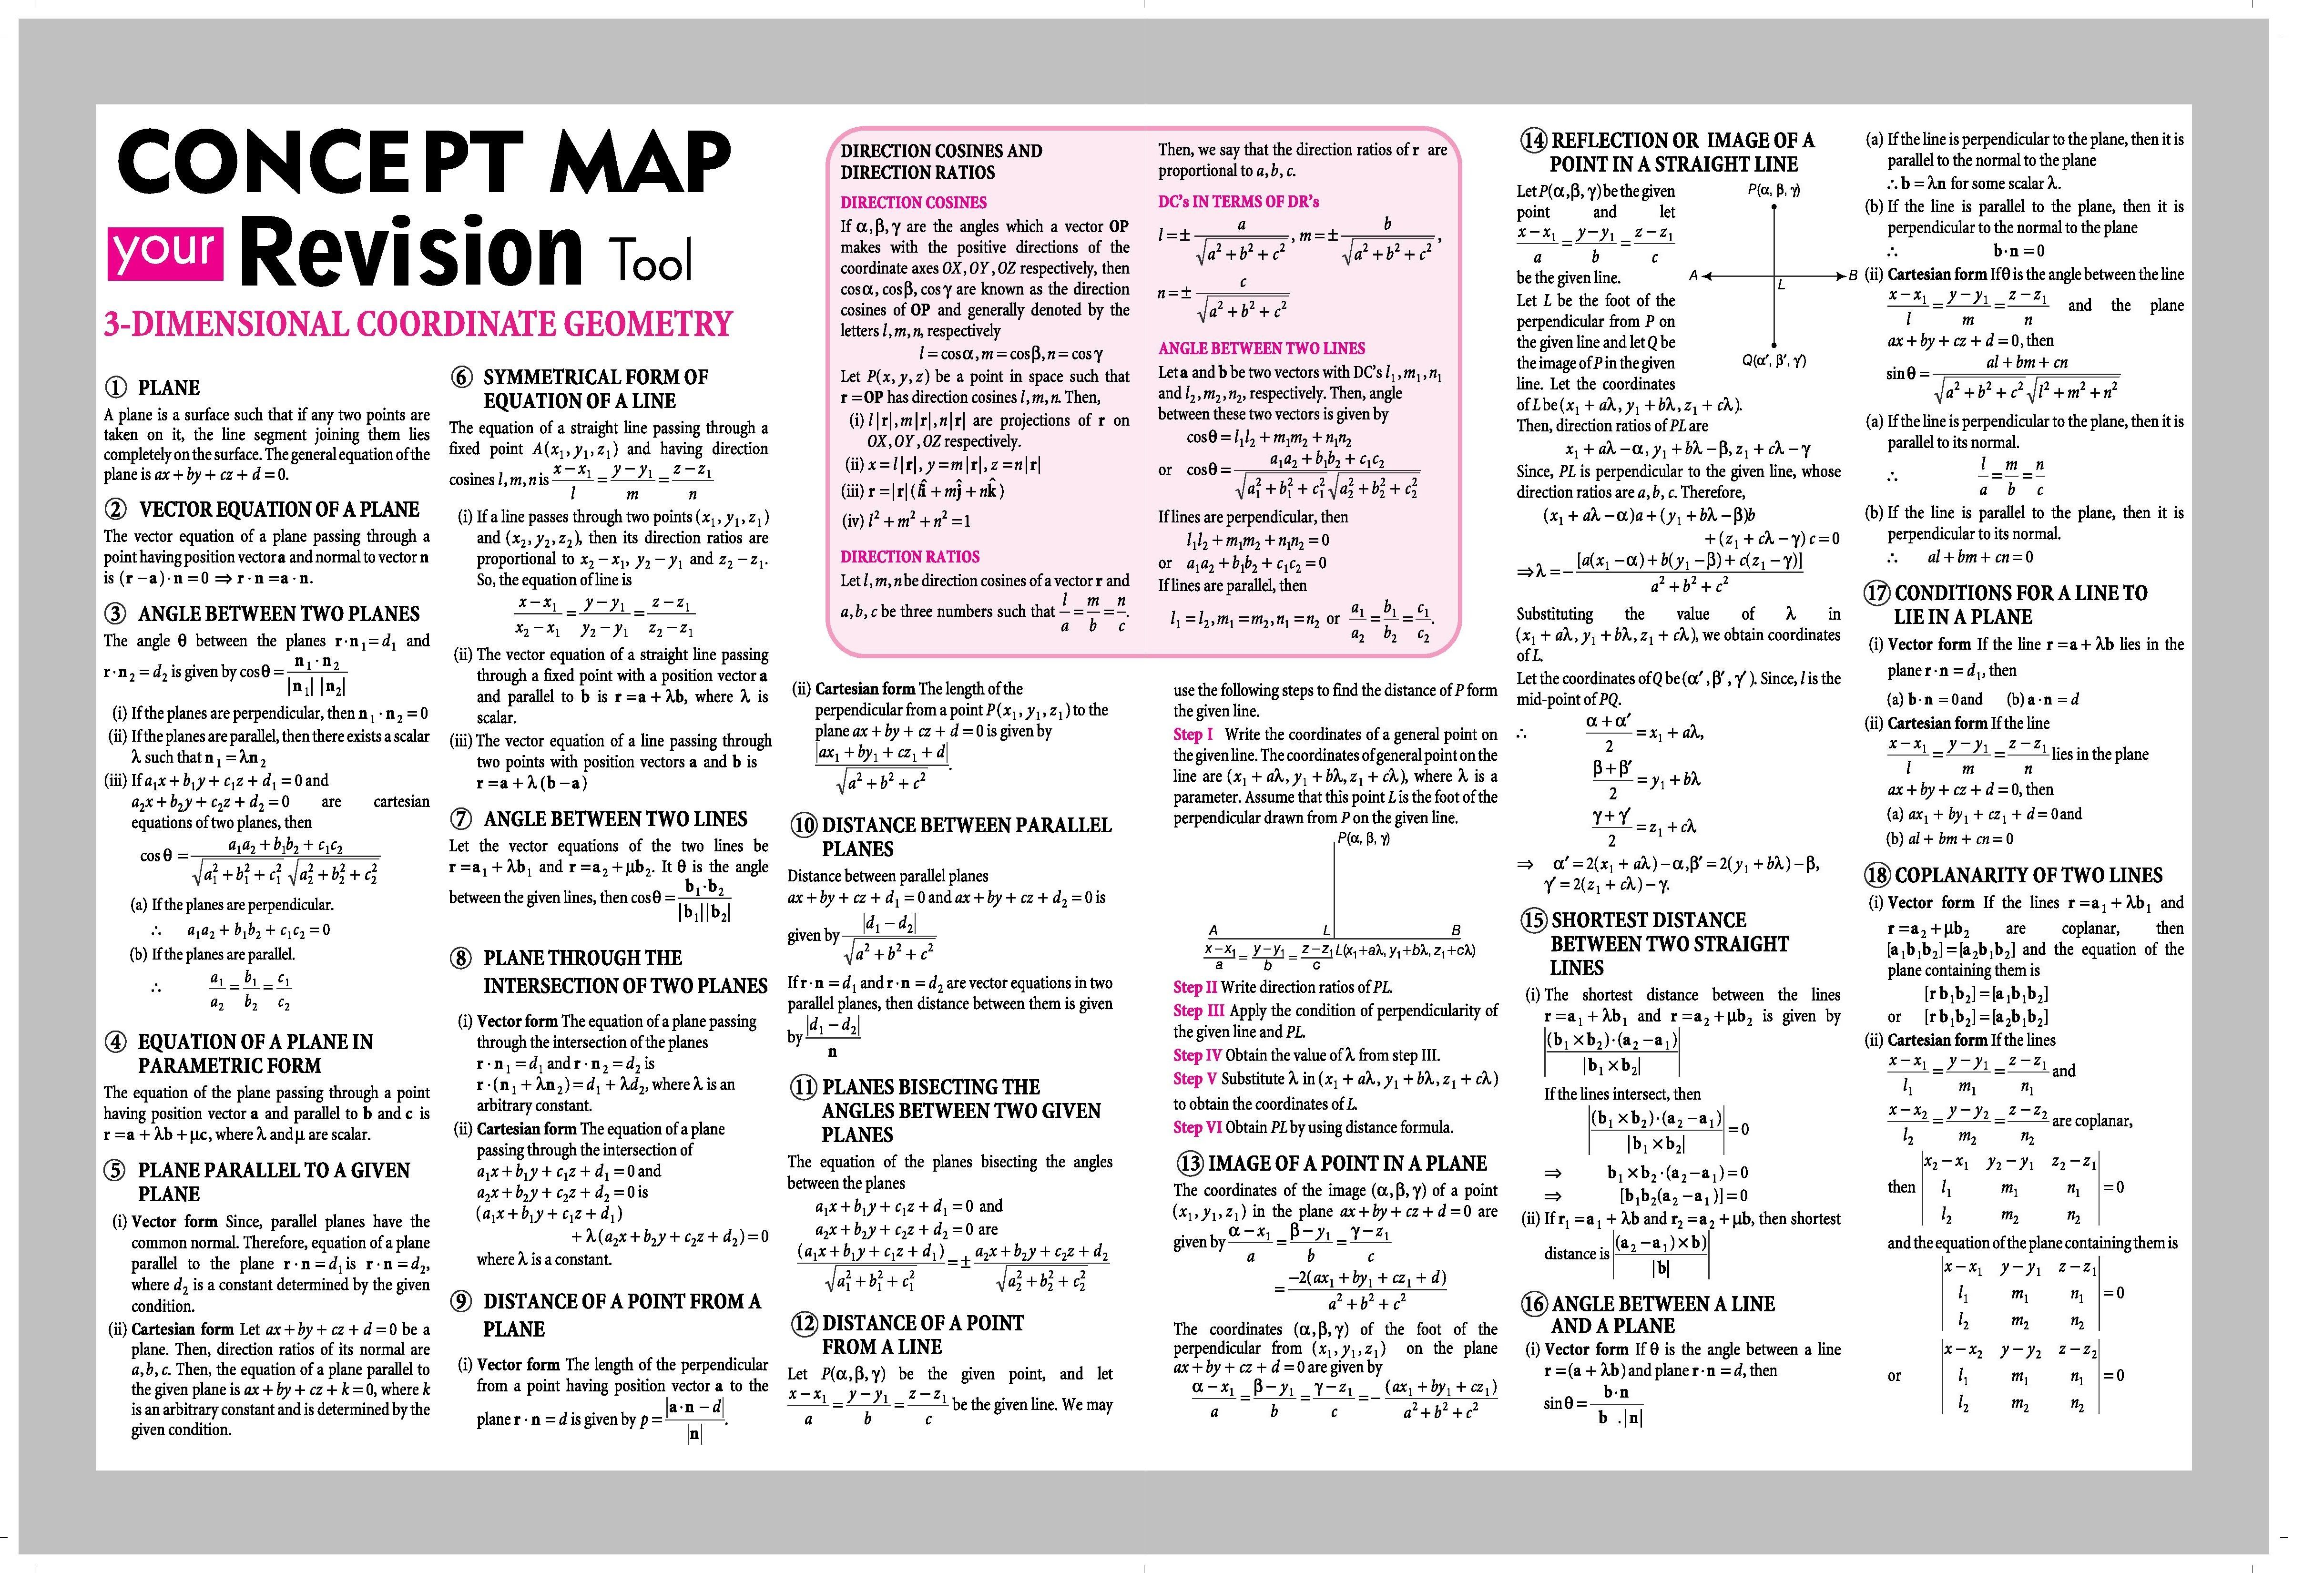 3d Coordinate Geometry Concept Map Your Revision Tool Arihant Mathematics Spectrum M Mathematics Education Mathematics Worksheets Studying Math [ 3300 x 4876 Pixel ]